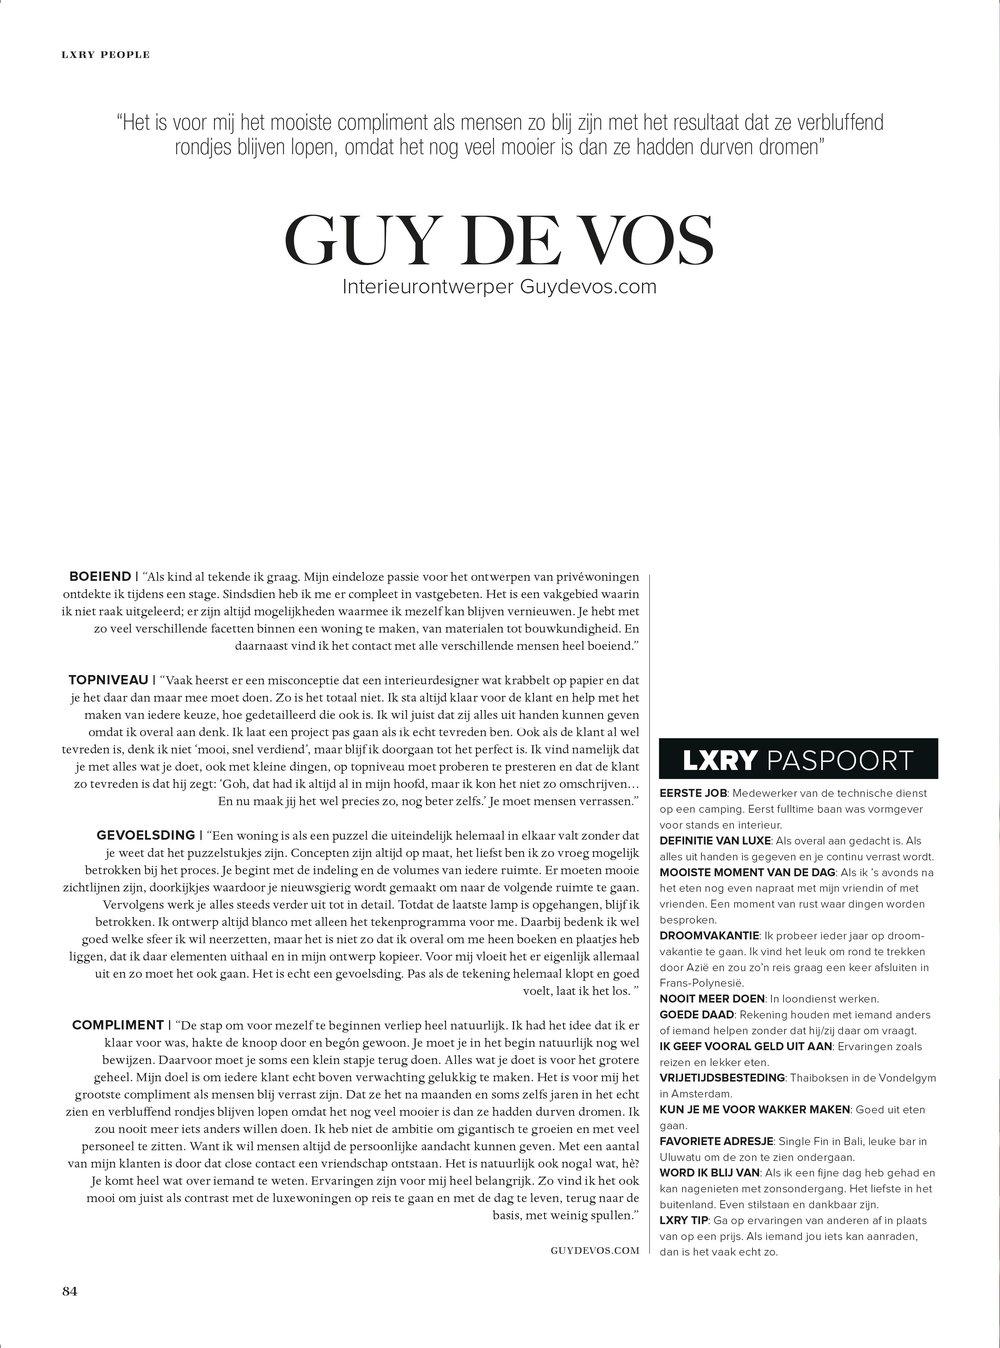 Guy de Vos-LXRY-1.jpg